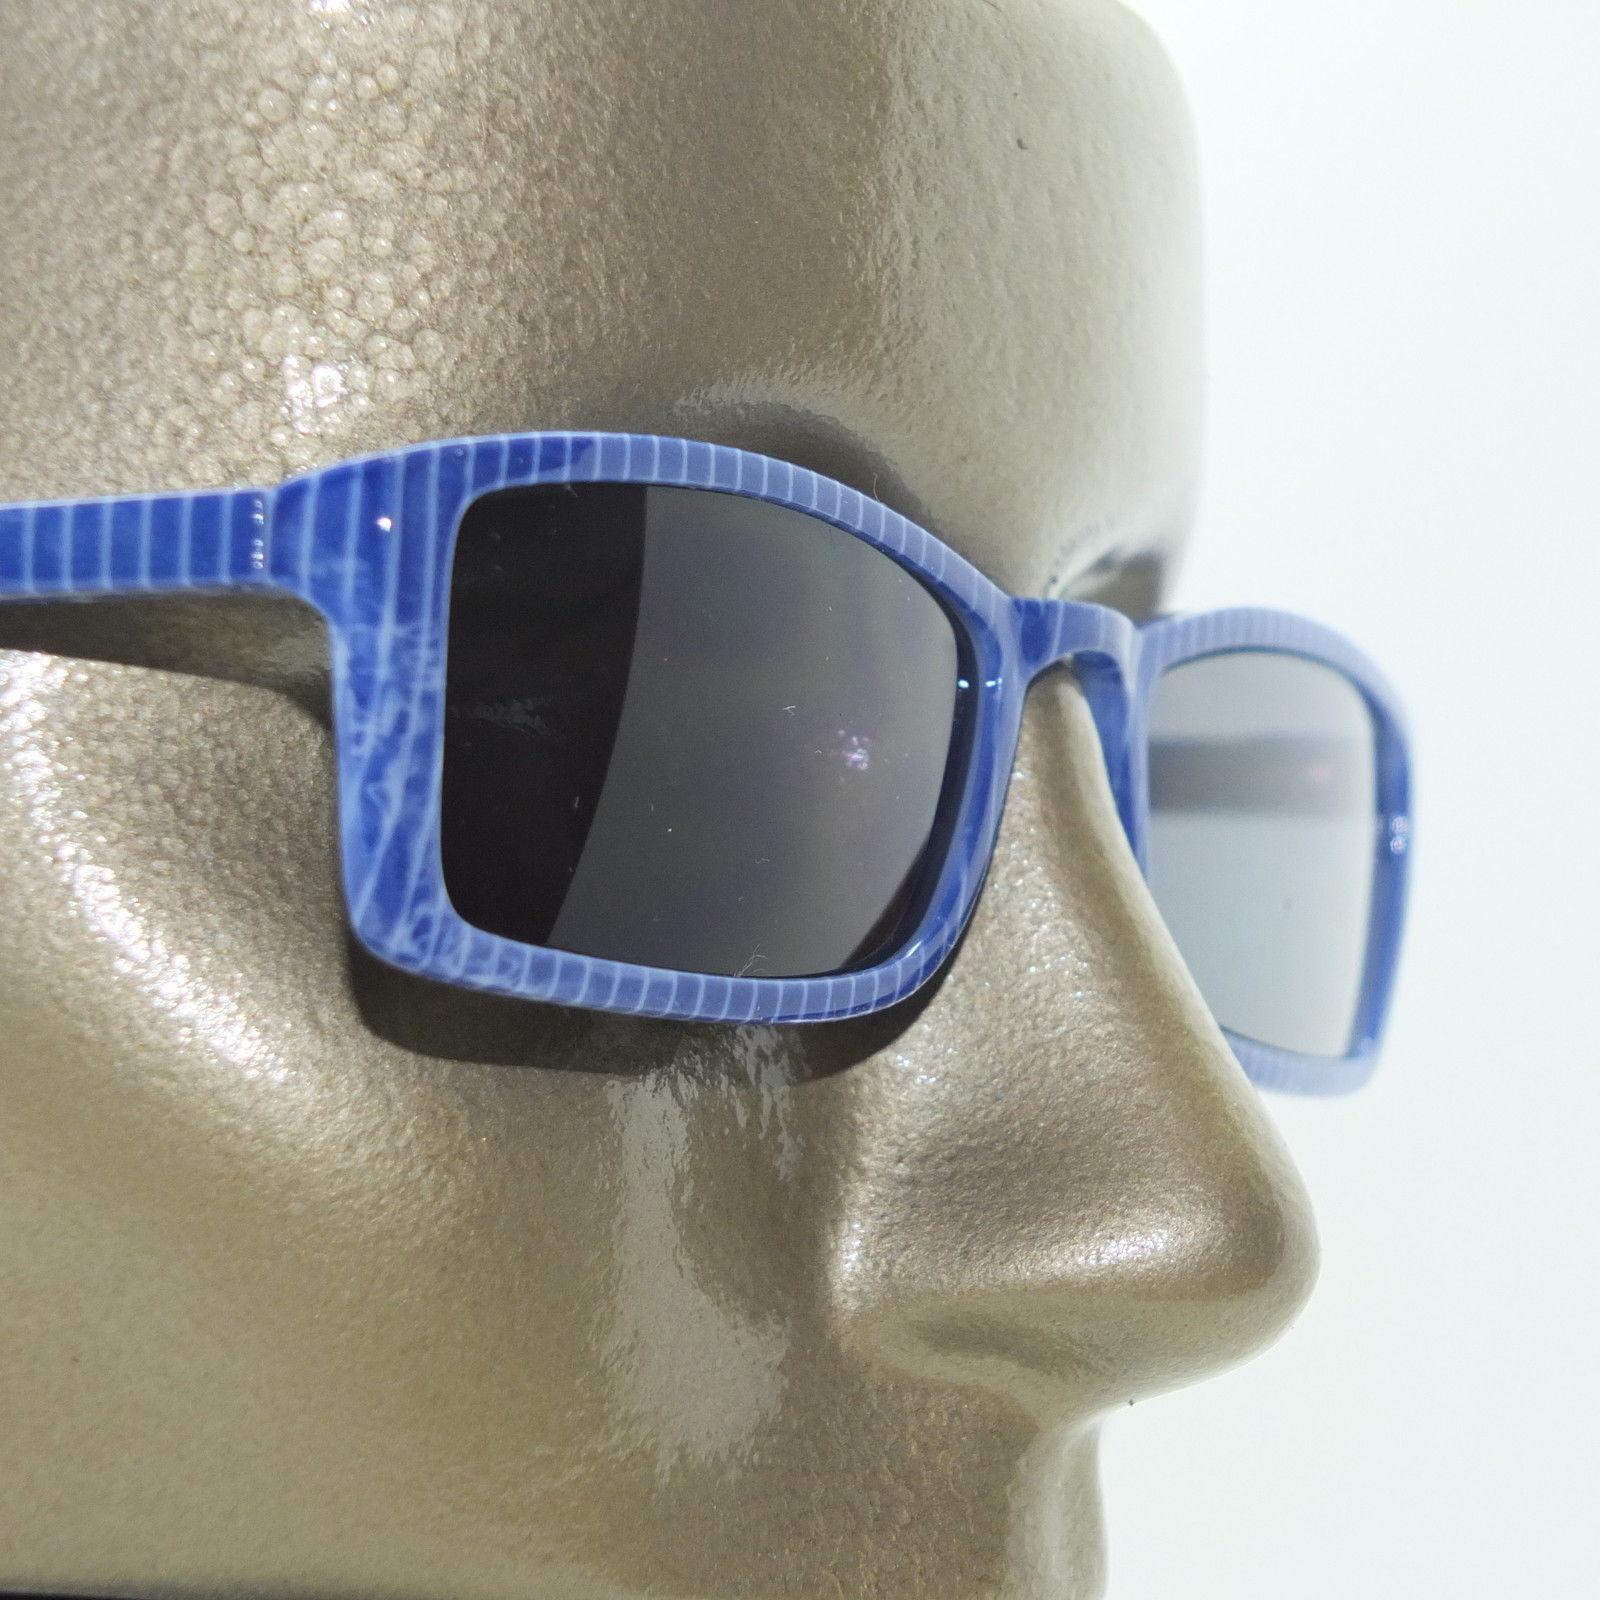 1acbfdc5cca 57. 57. Previous. True Blue Business Stripe +1.50 Tinted Reading Glasses  Sun Readers Sunglasses